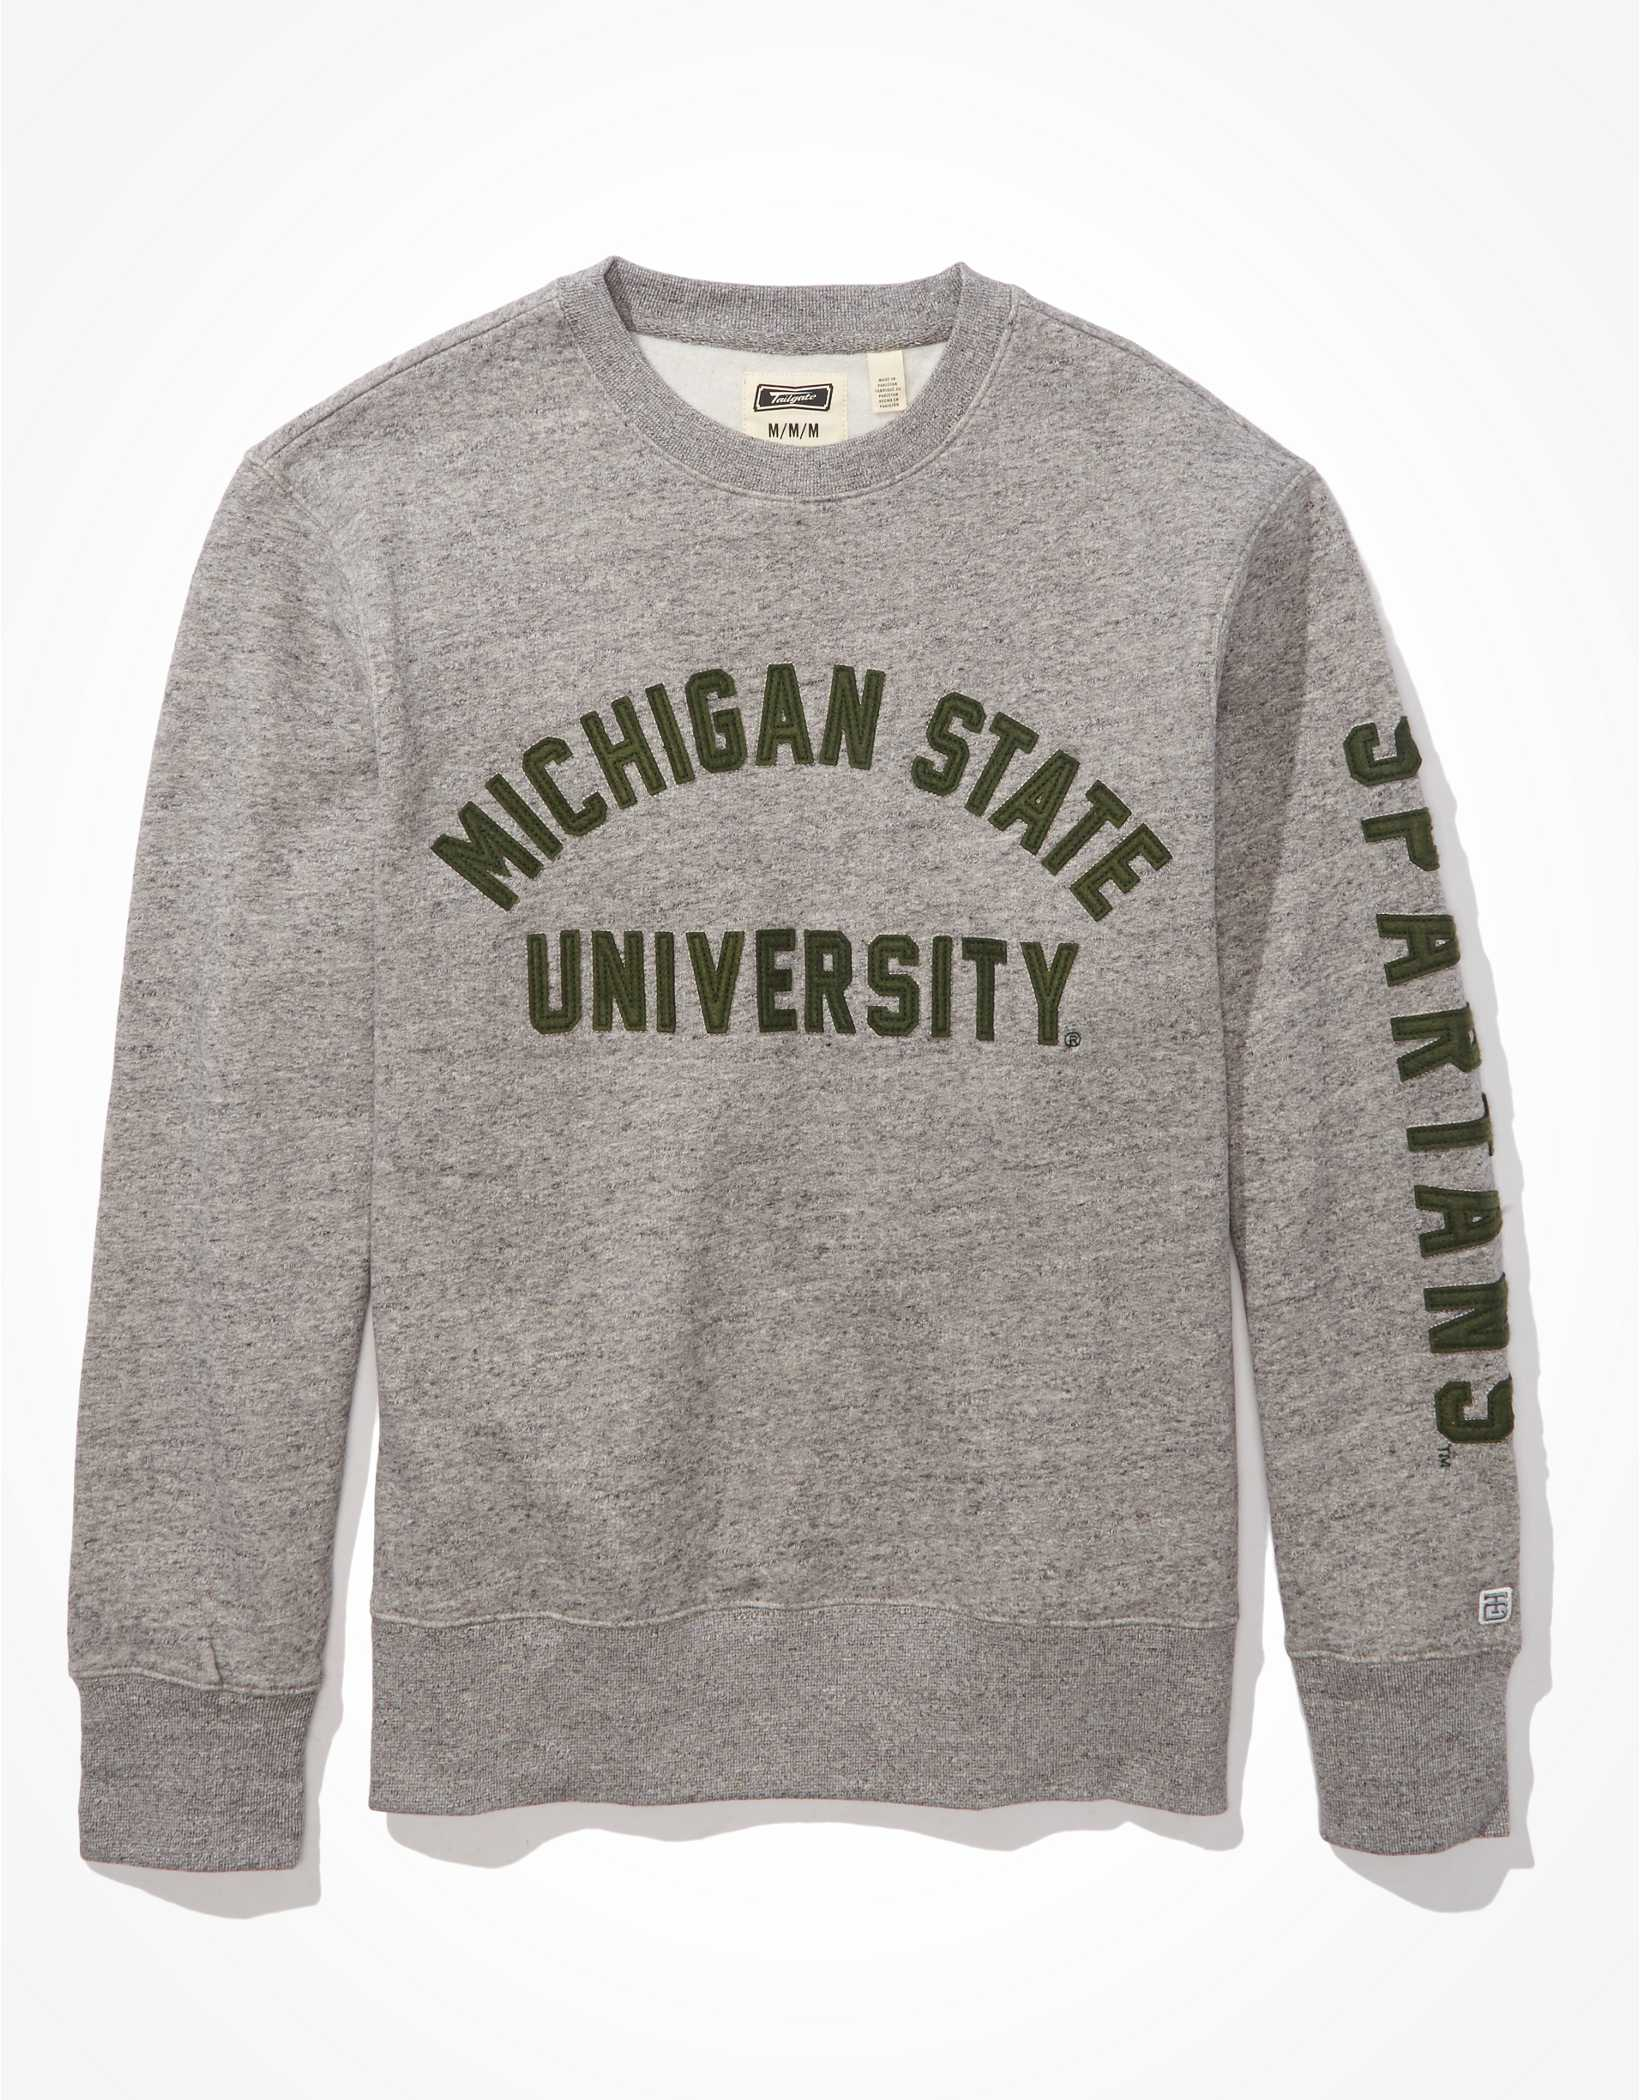 Tailgate Men's Michigan State Fleece Sweatshirt